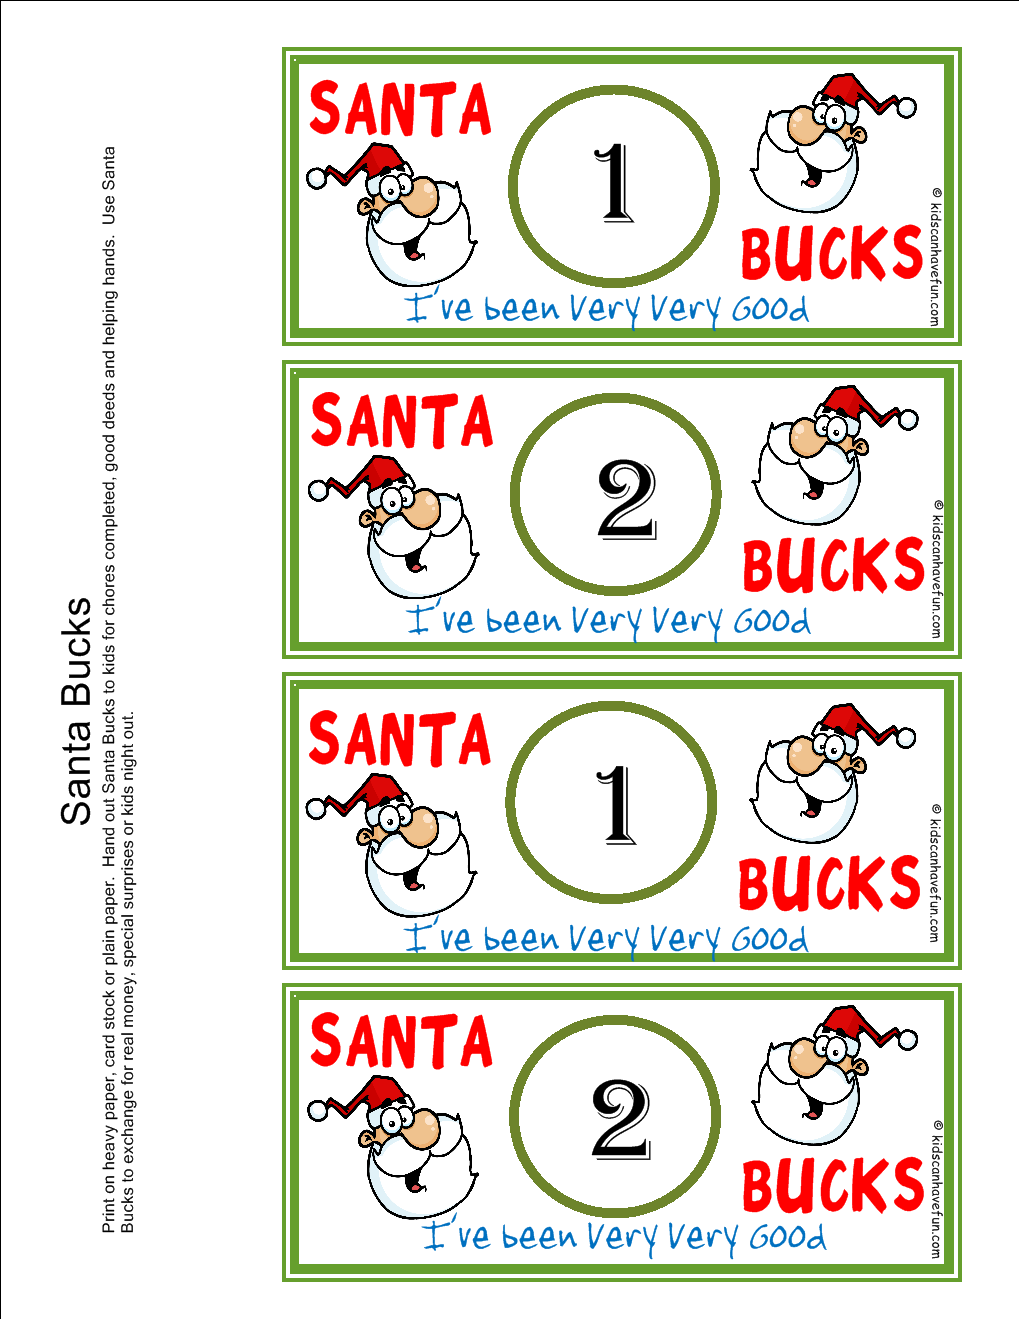 Santa Bucks Reward - Kids earn bucks during the holidays. | Xmas ...